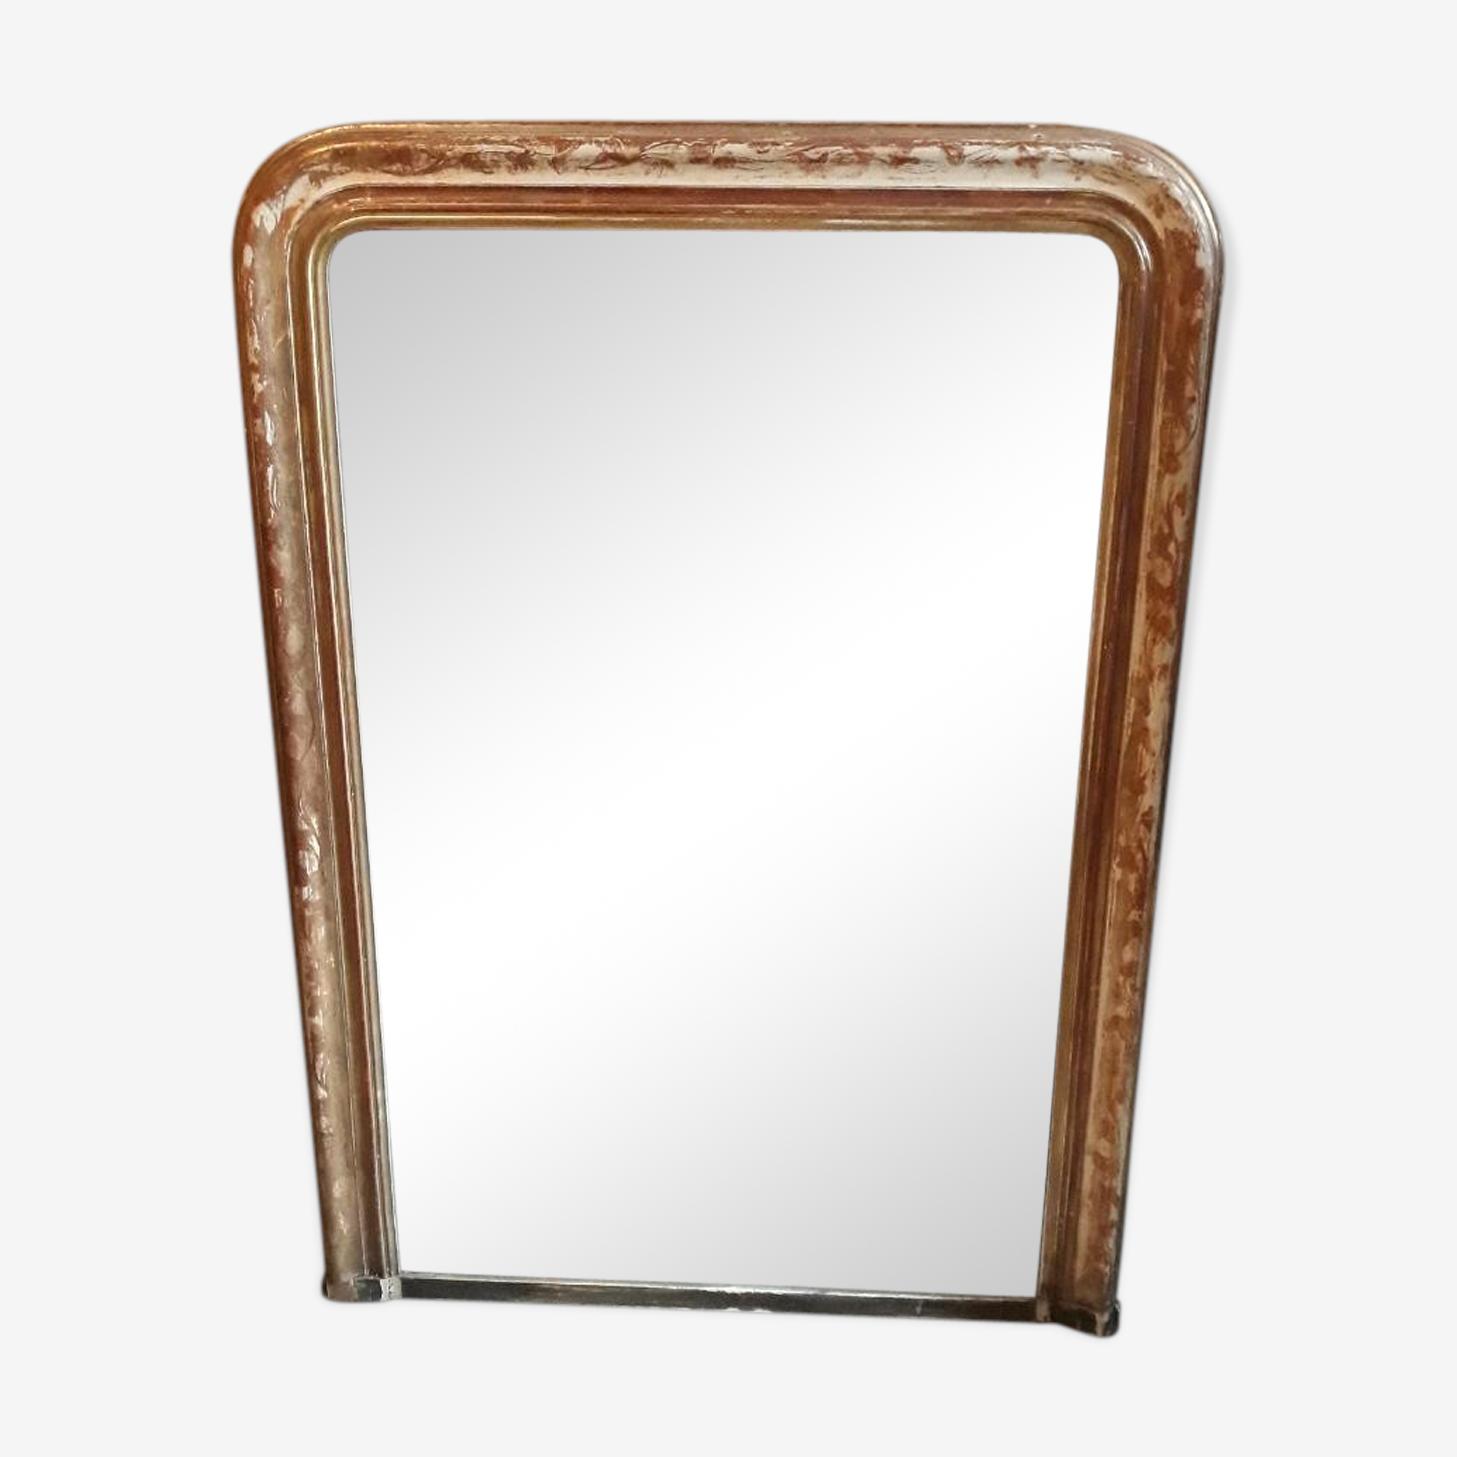 Large mirror 158 X 112cm